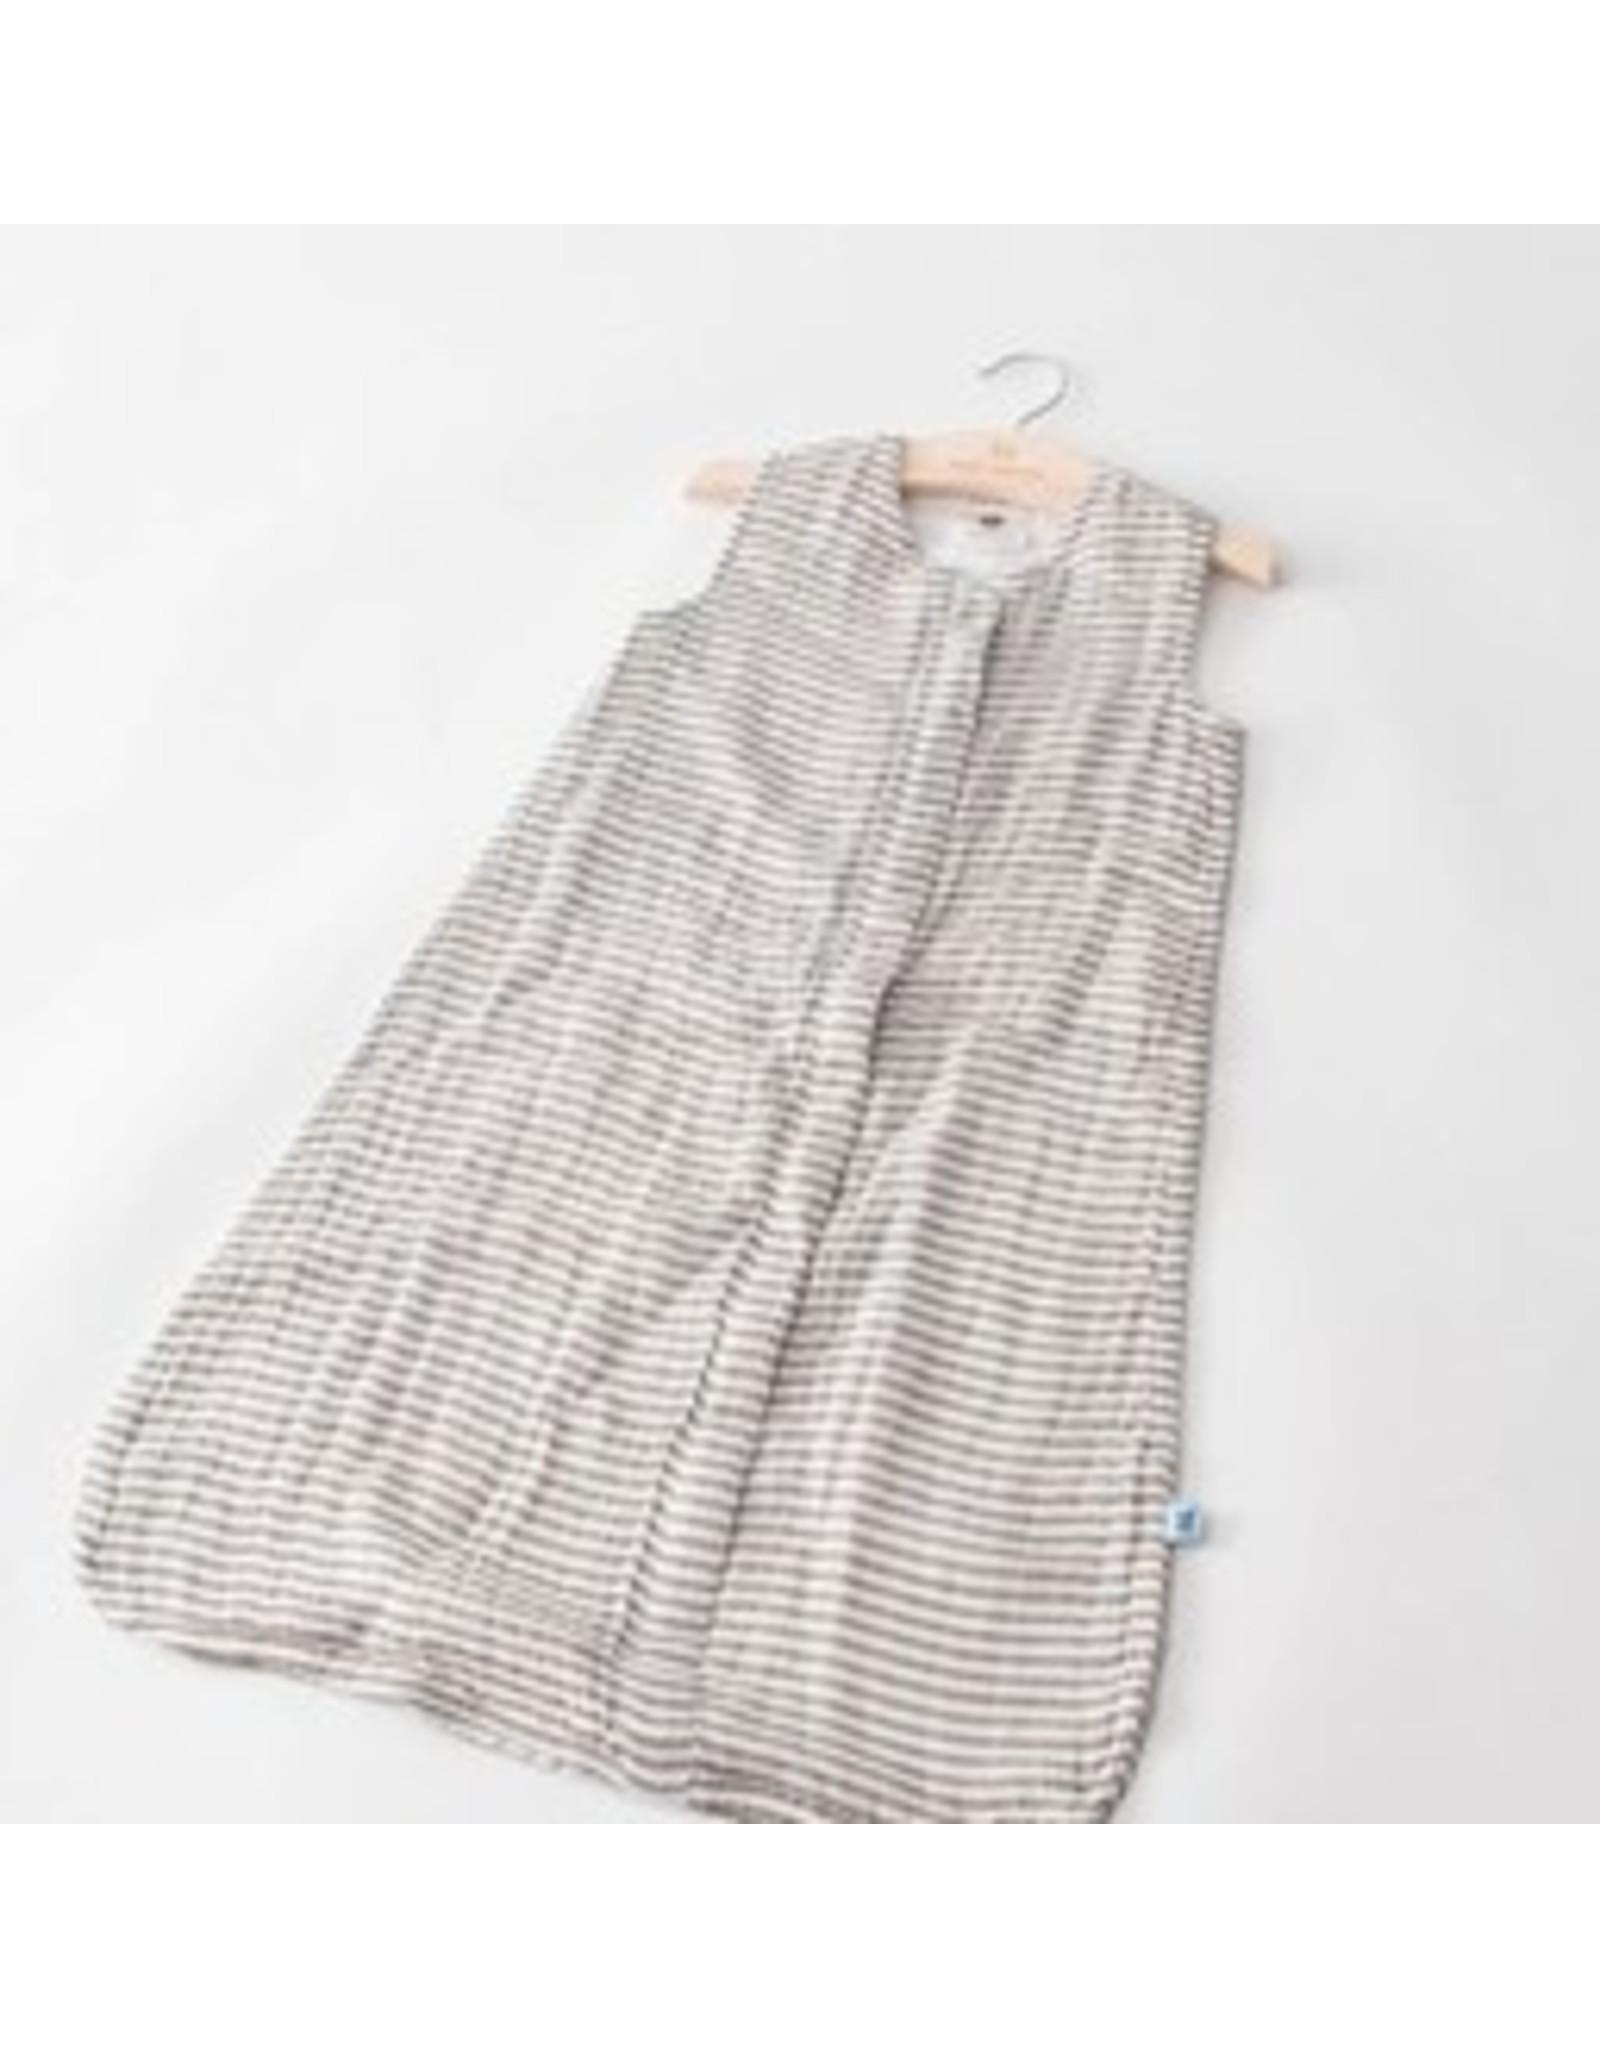 Sleeping Bag Grey Stripe M REG LH